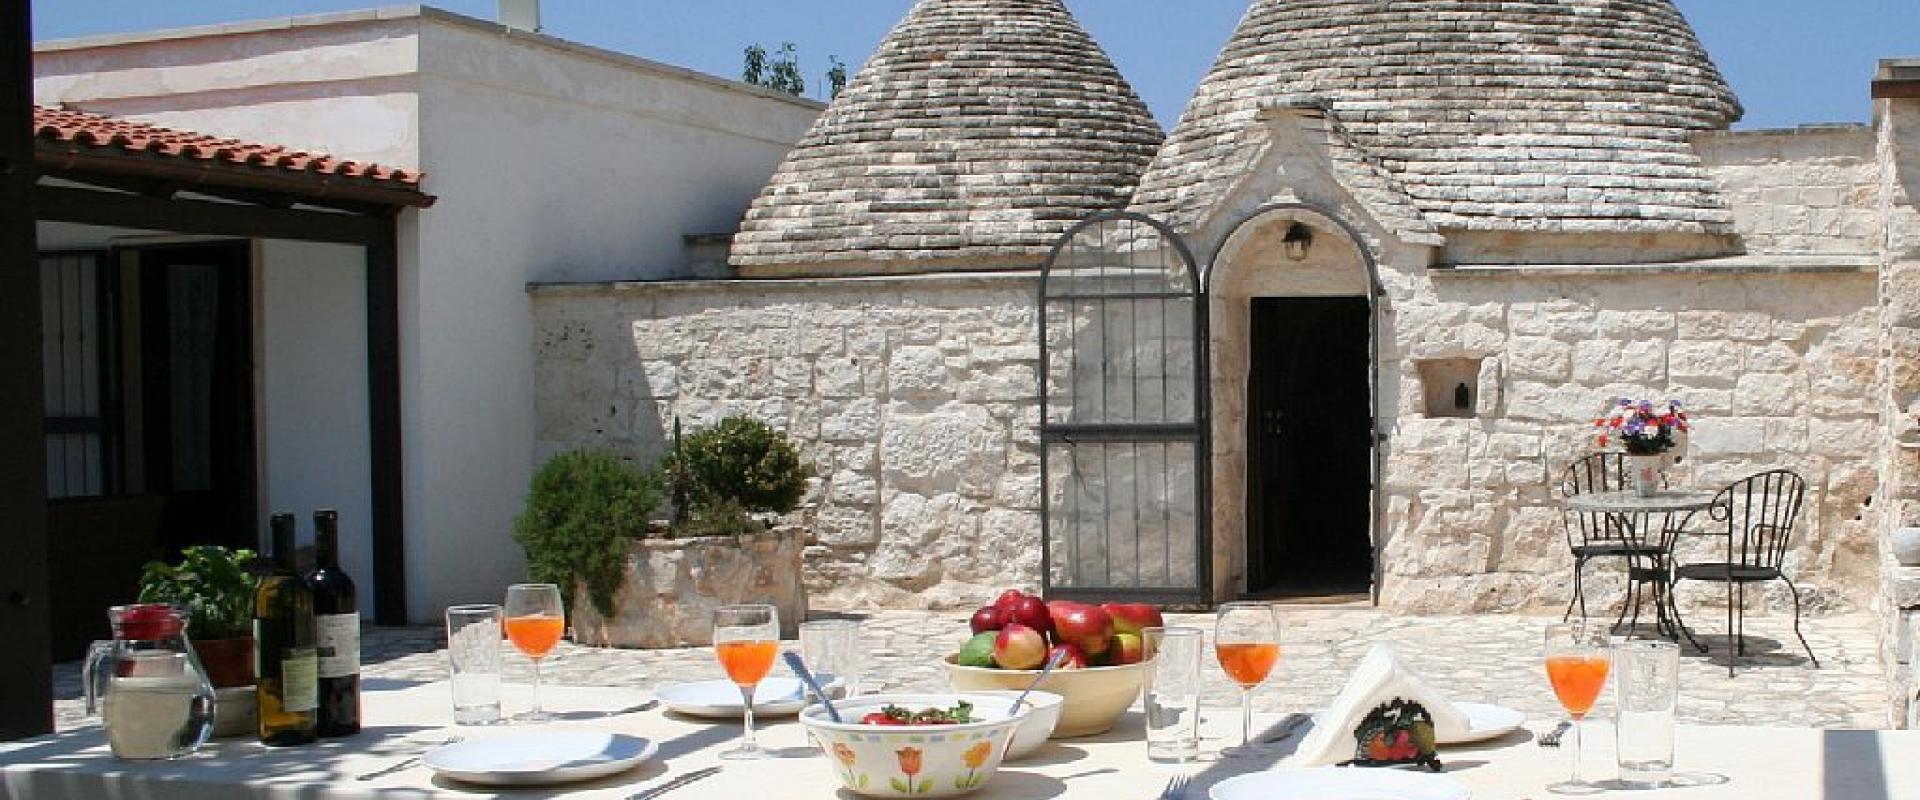 Typical lunch inside trullo of Alberobello